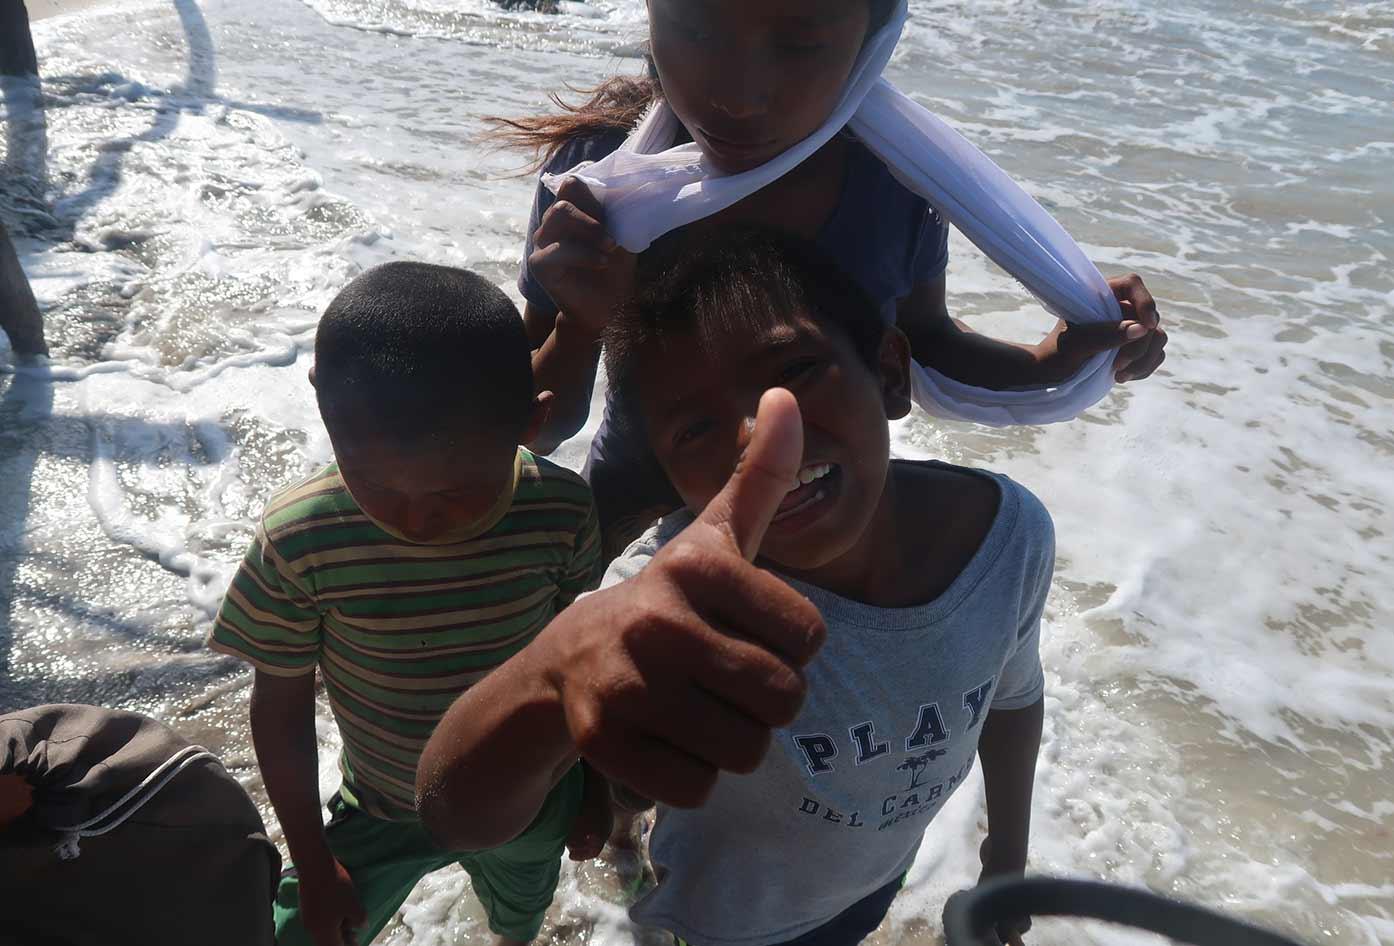 mayapo beach colombia